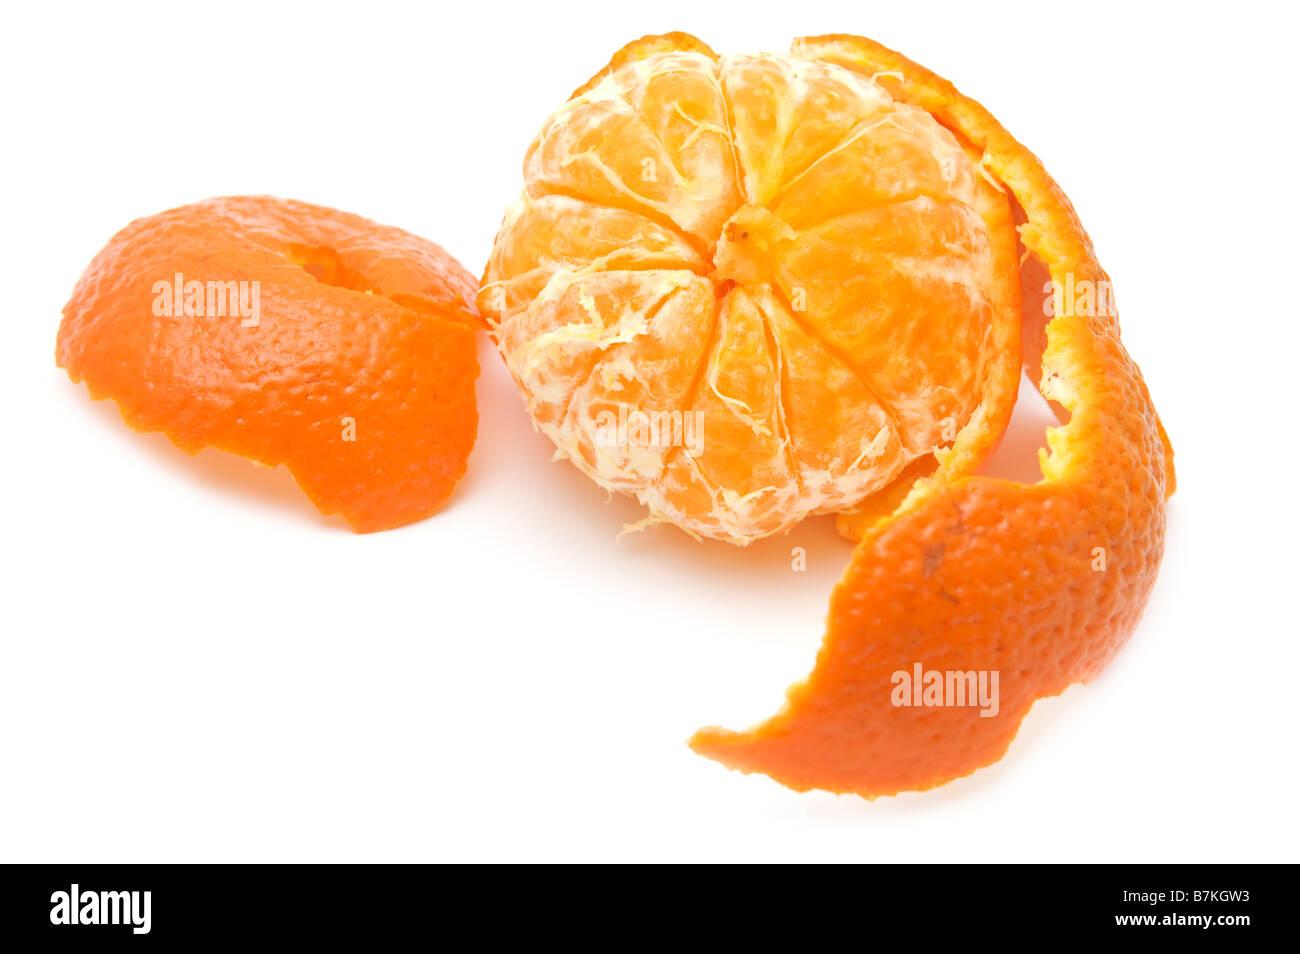 object on white food raw mandarin - Stock Image